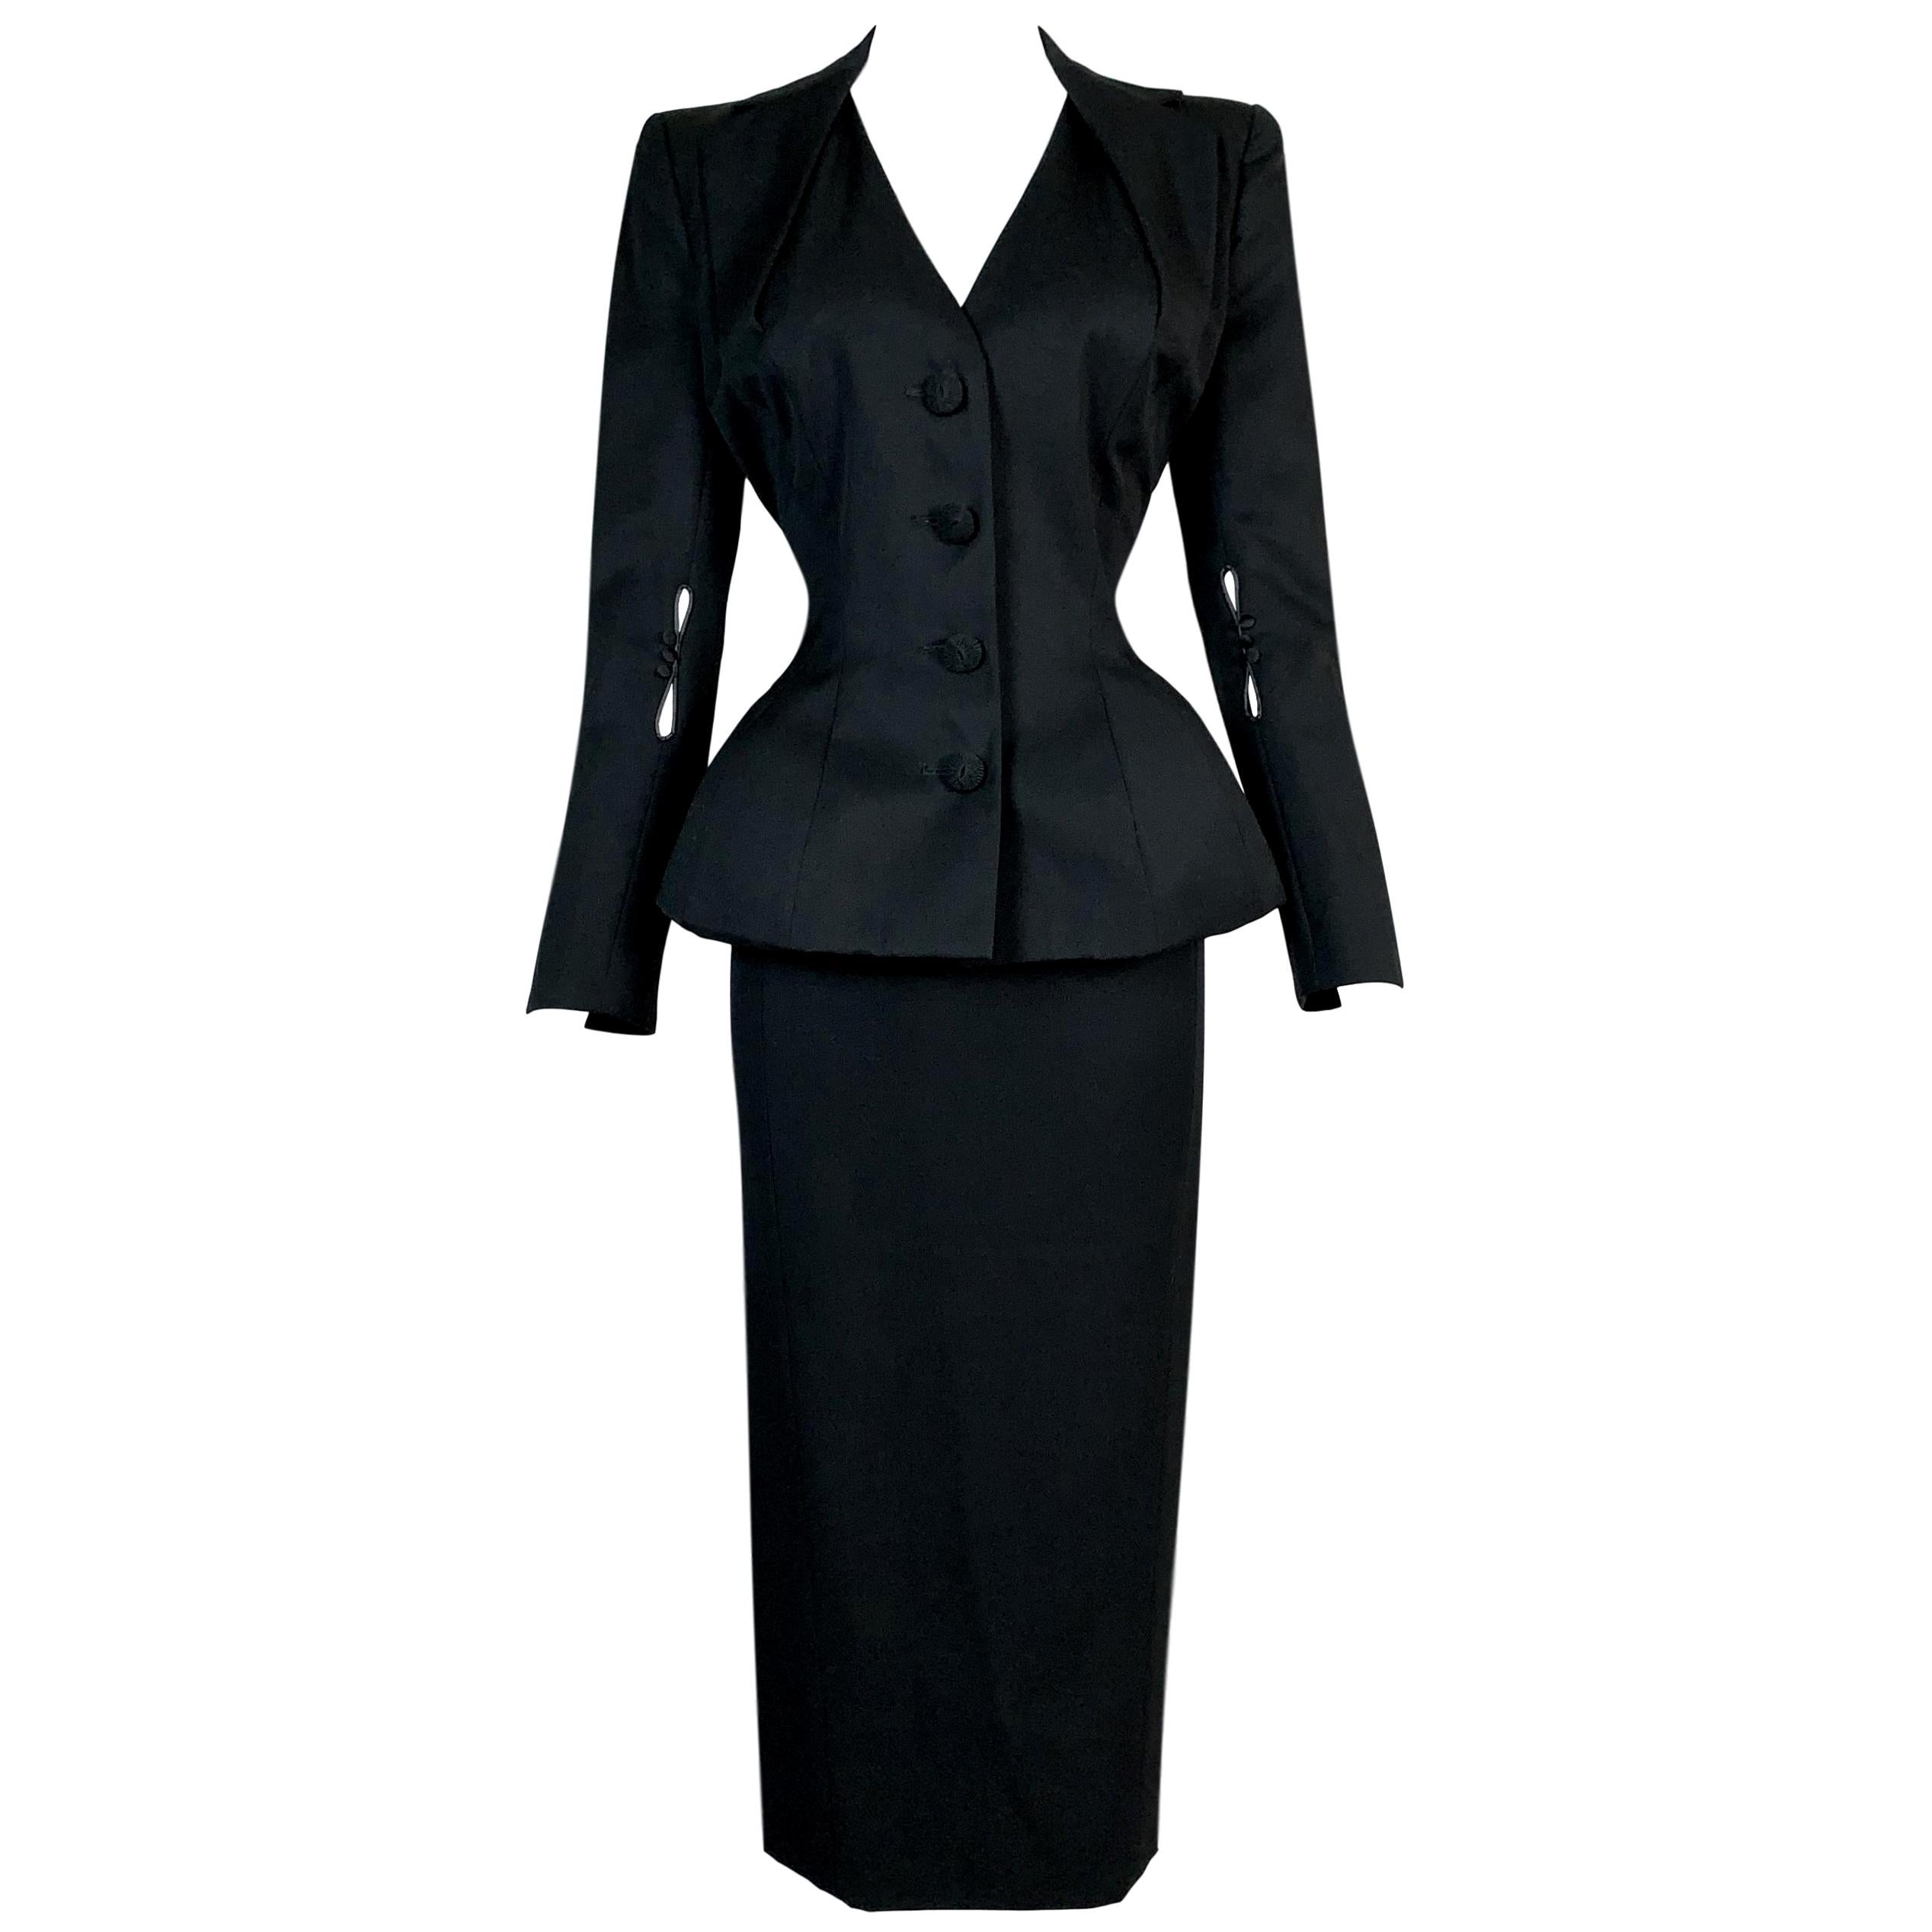 S/S 1995 John Galliano Runway Pin-Up Black Fitted Peplum Skirt Jacket Suit